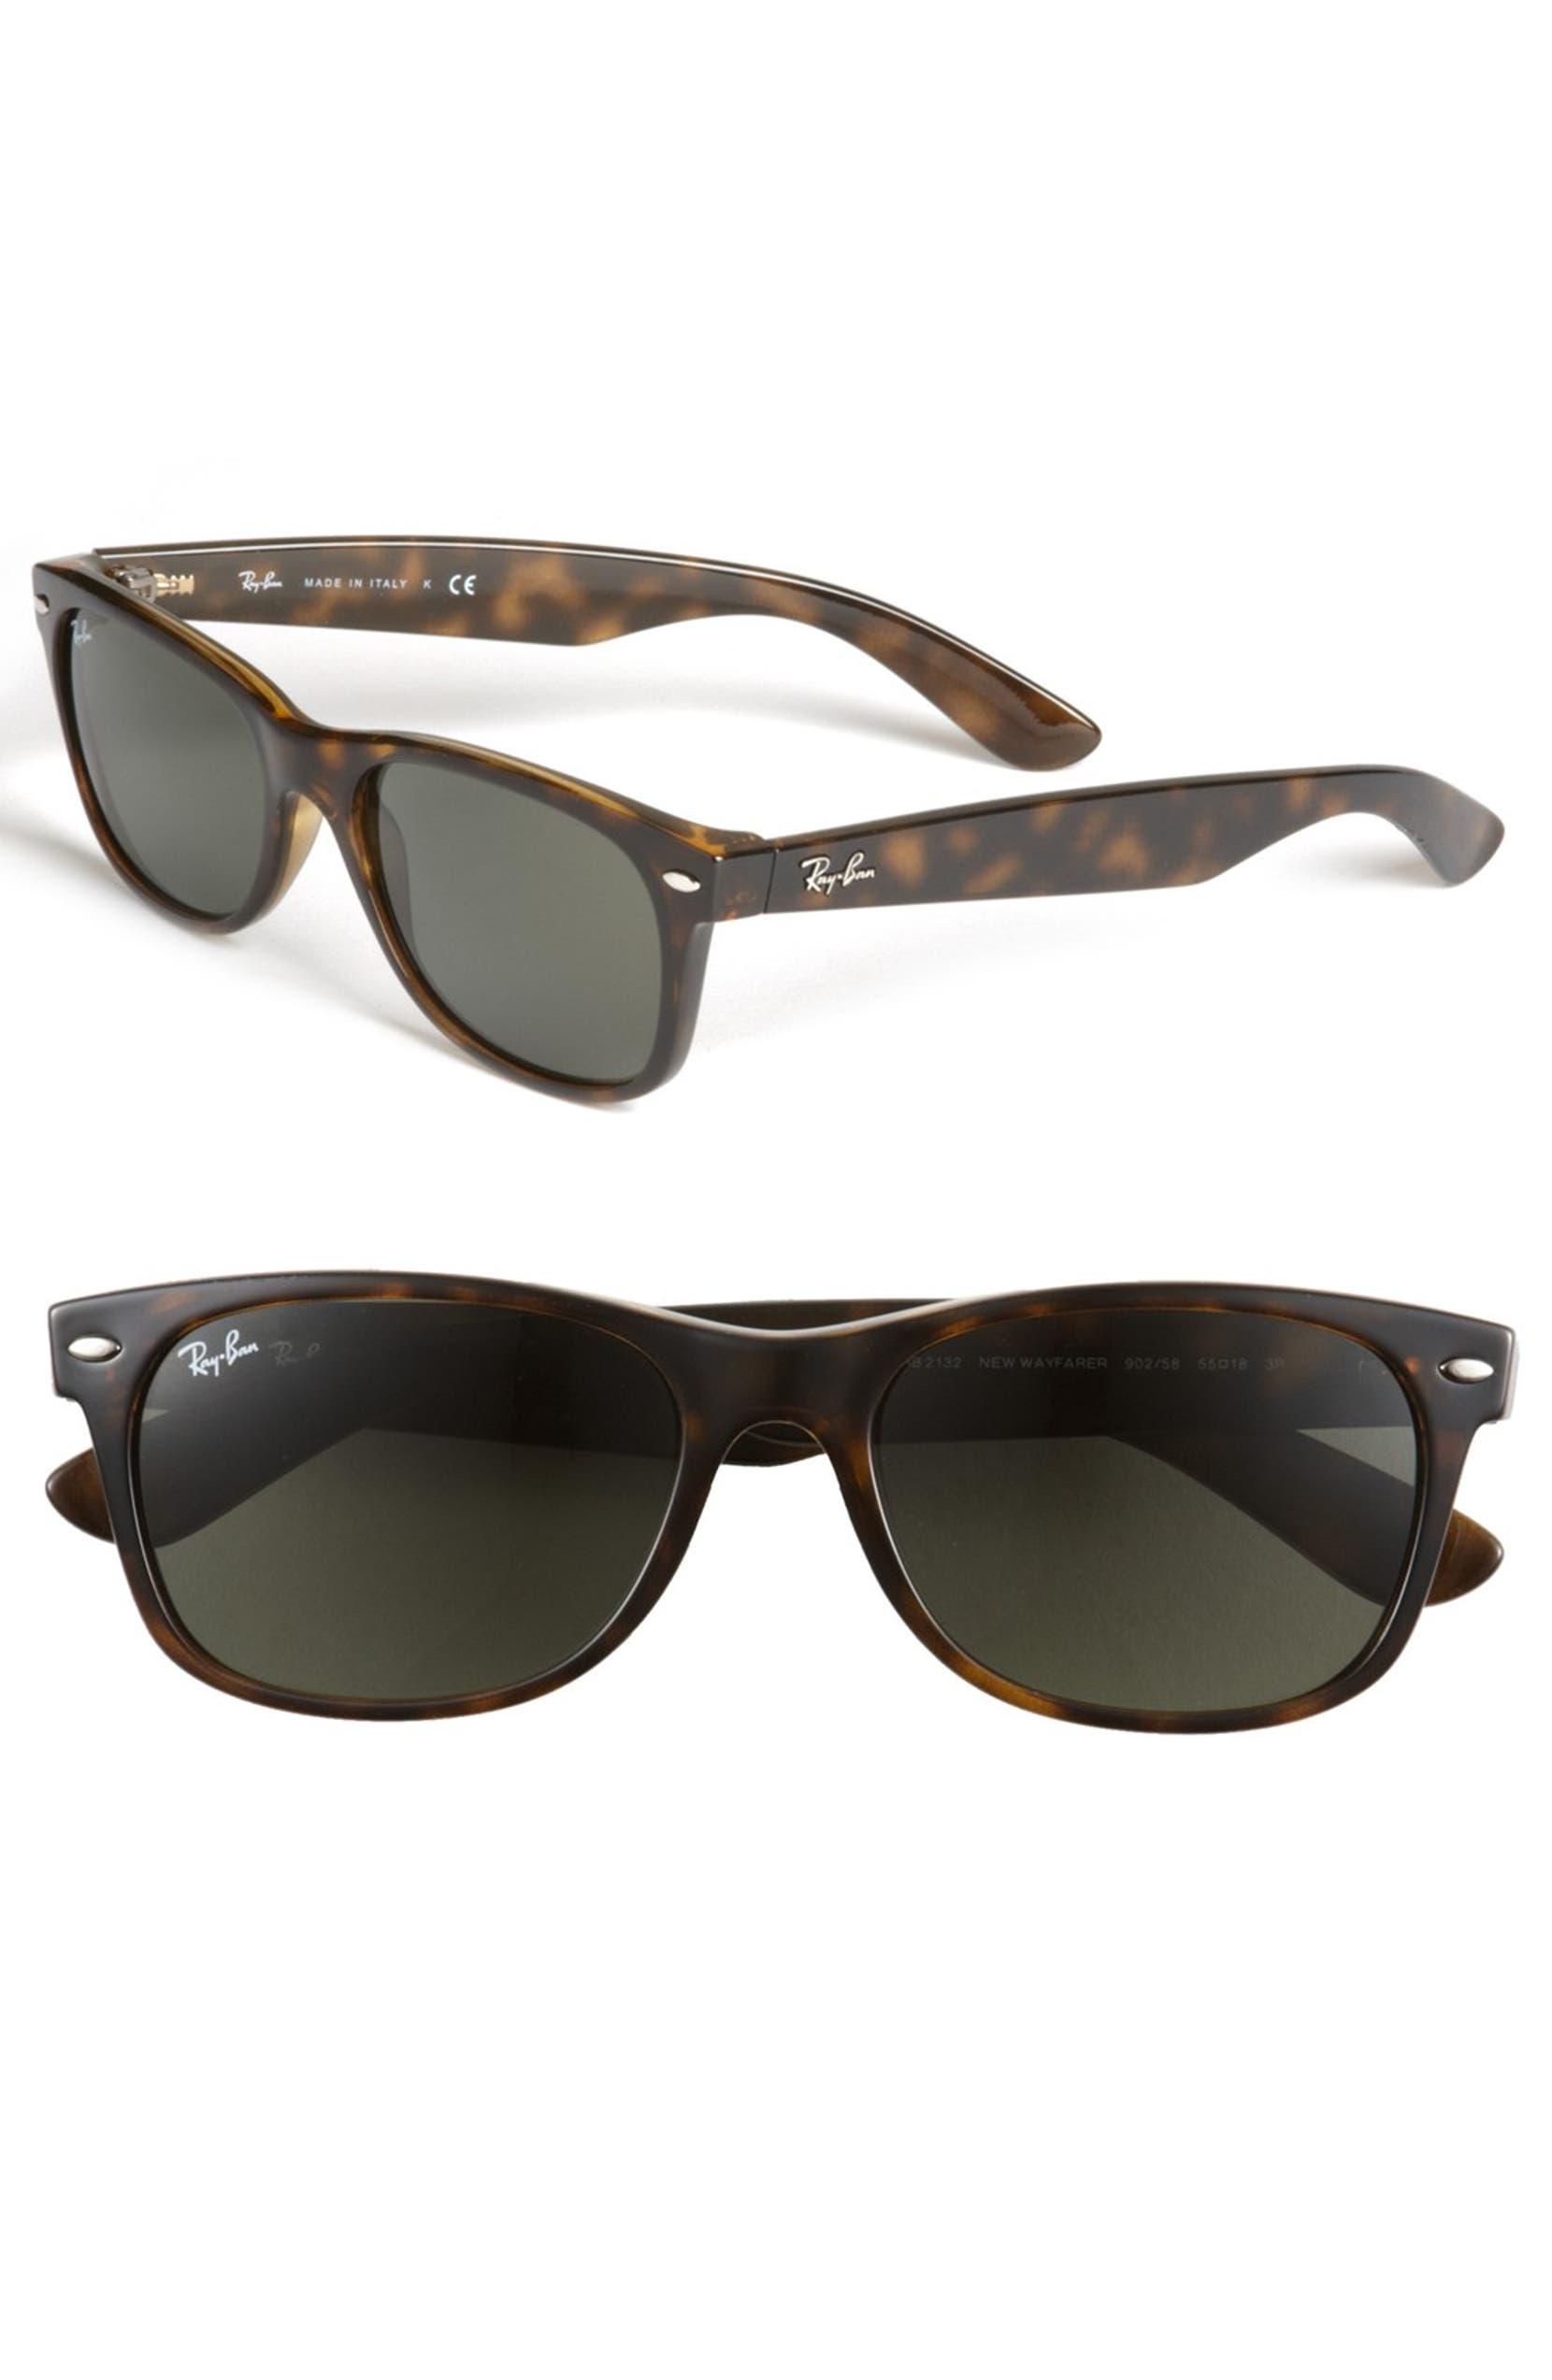 Ray-Ban  New Wayfarer  55mm Sunglasses  61a57ba5230b1